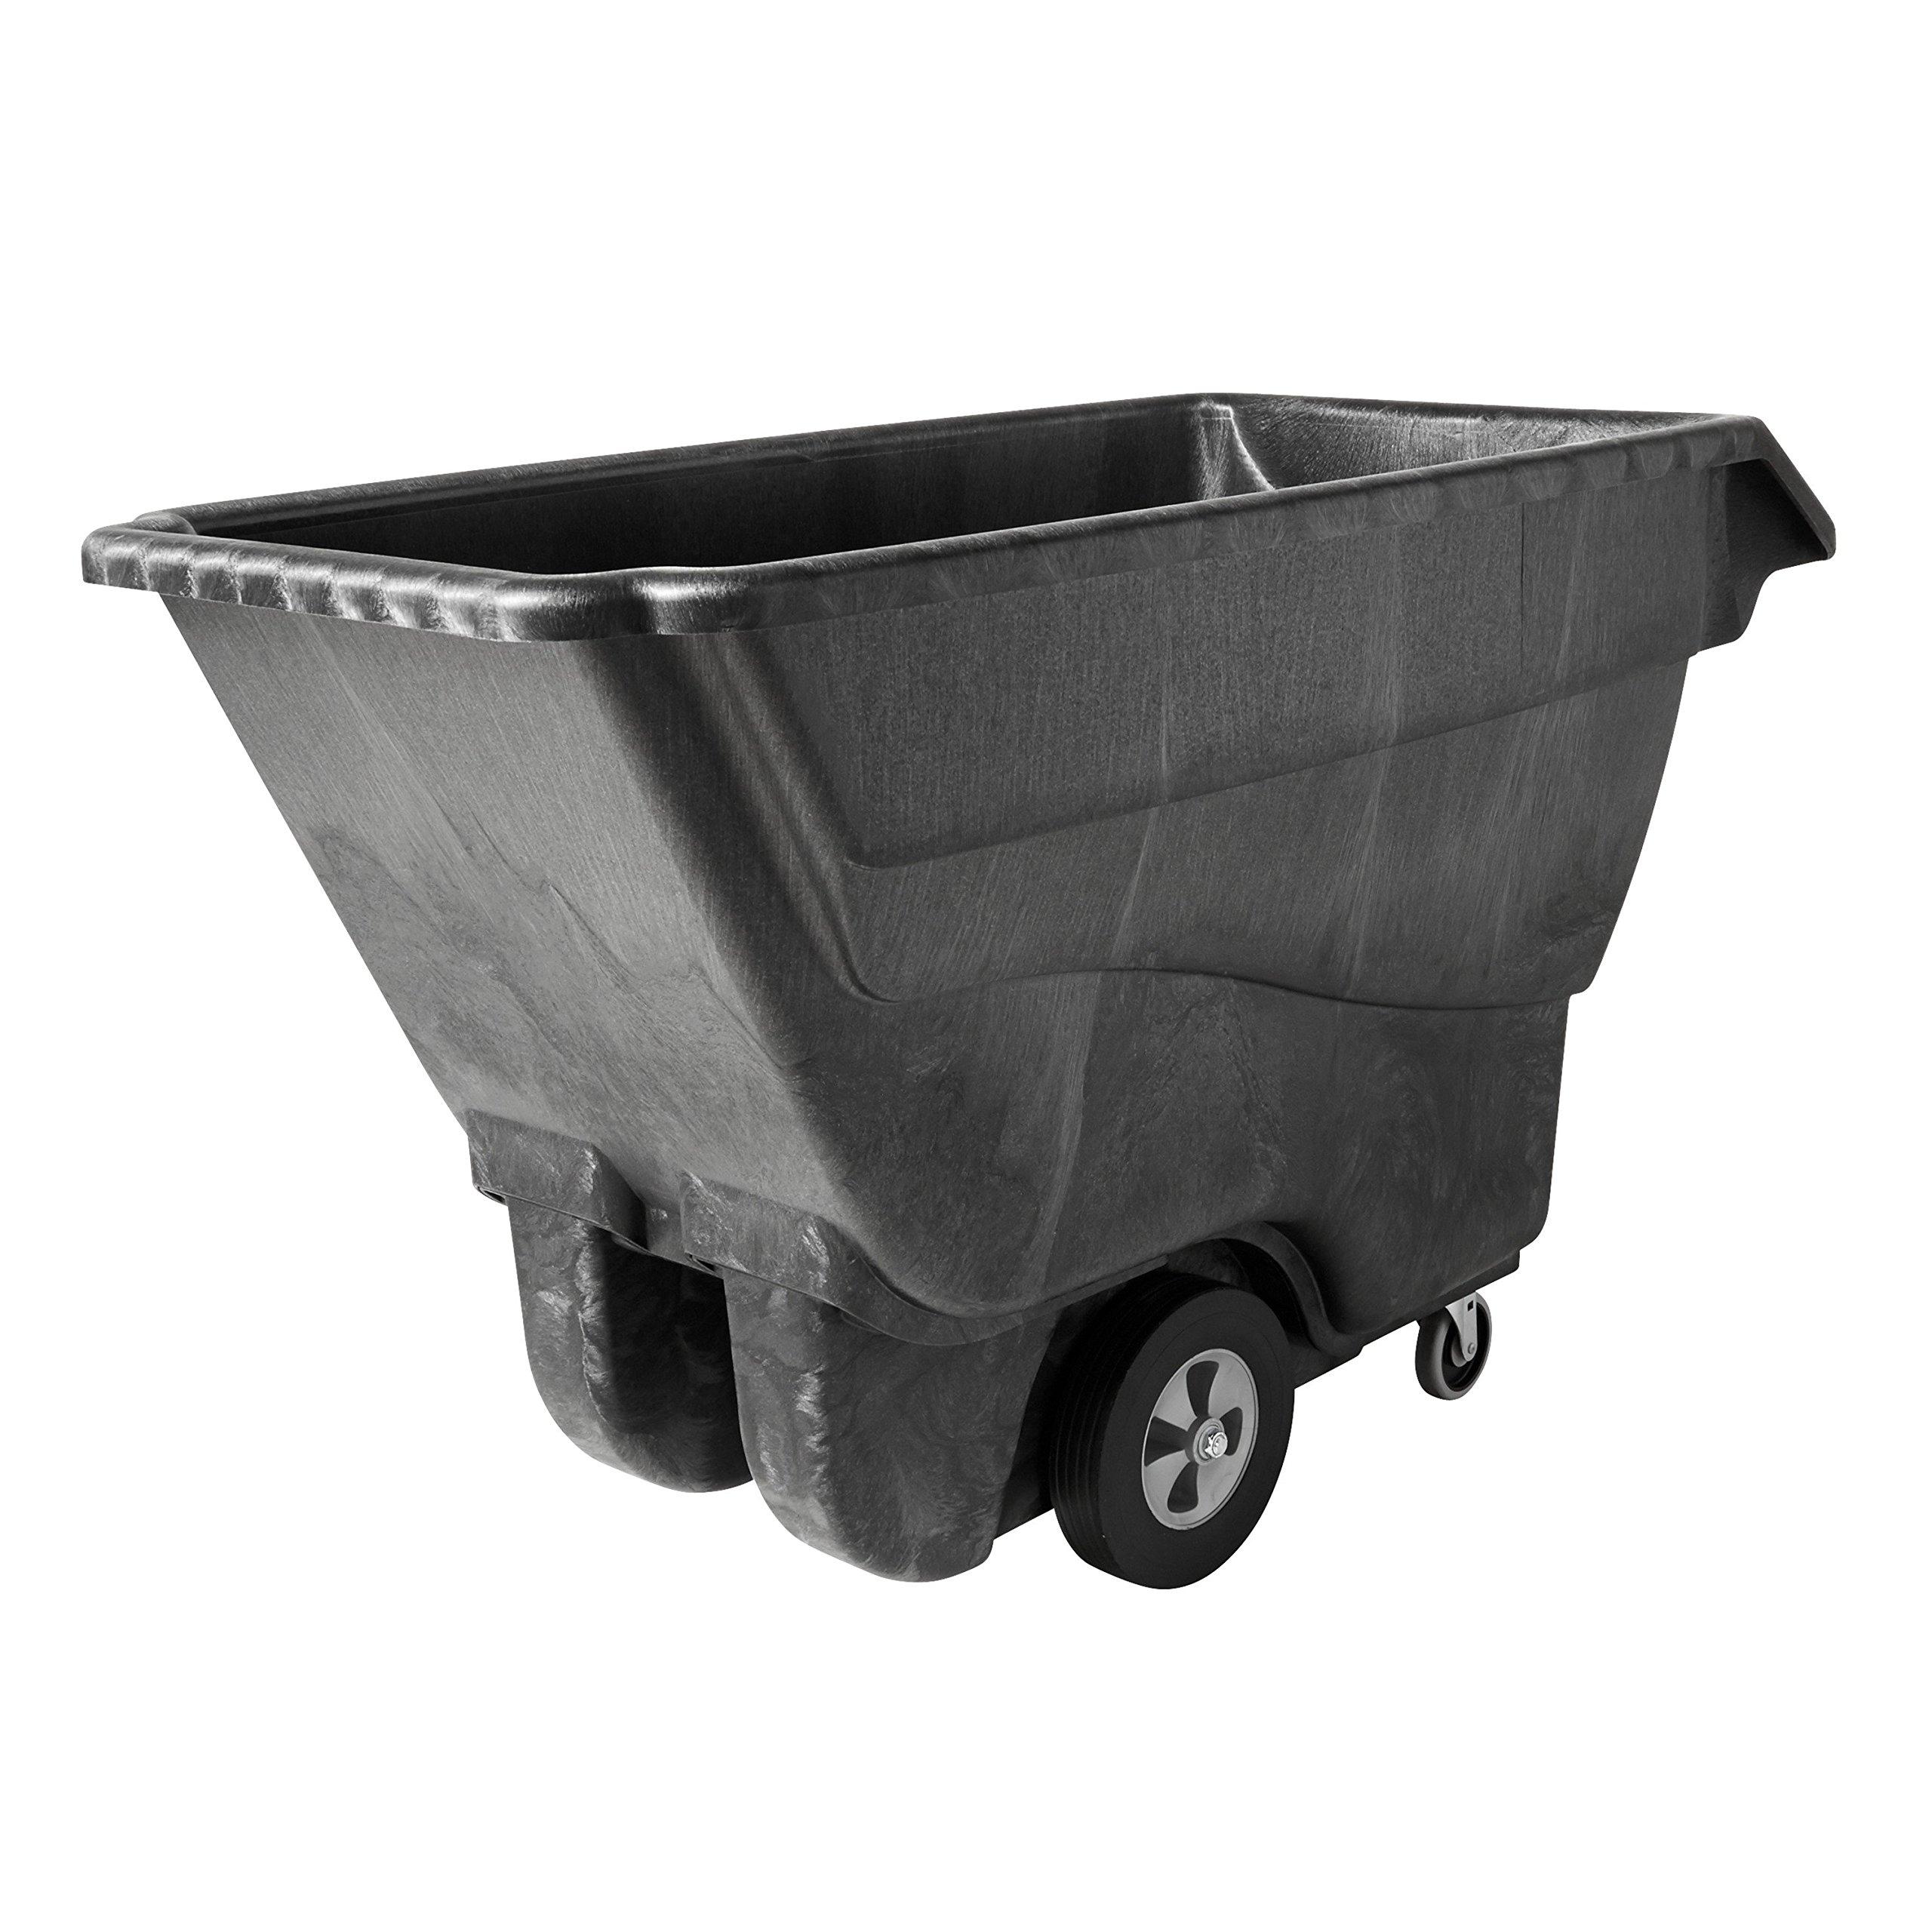 Rubbermaid Commercial FG9T1500BLA Structural Foam Dump Truck, Black, 1250 lbs Load Capacity, Black